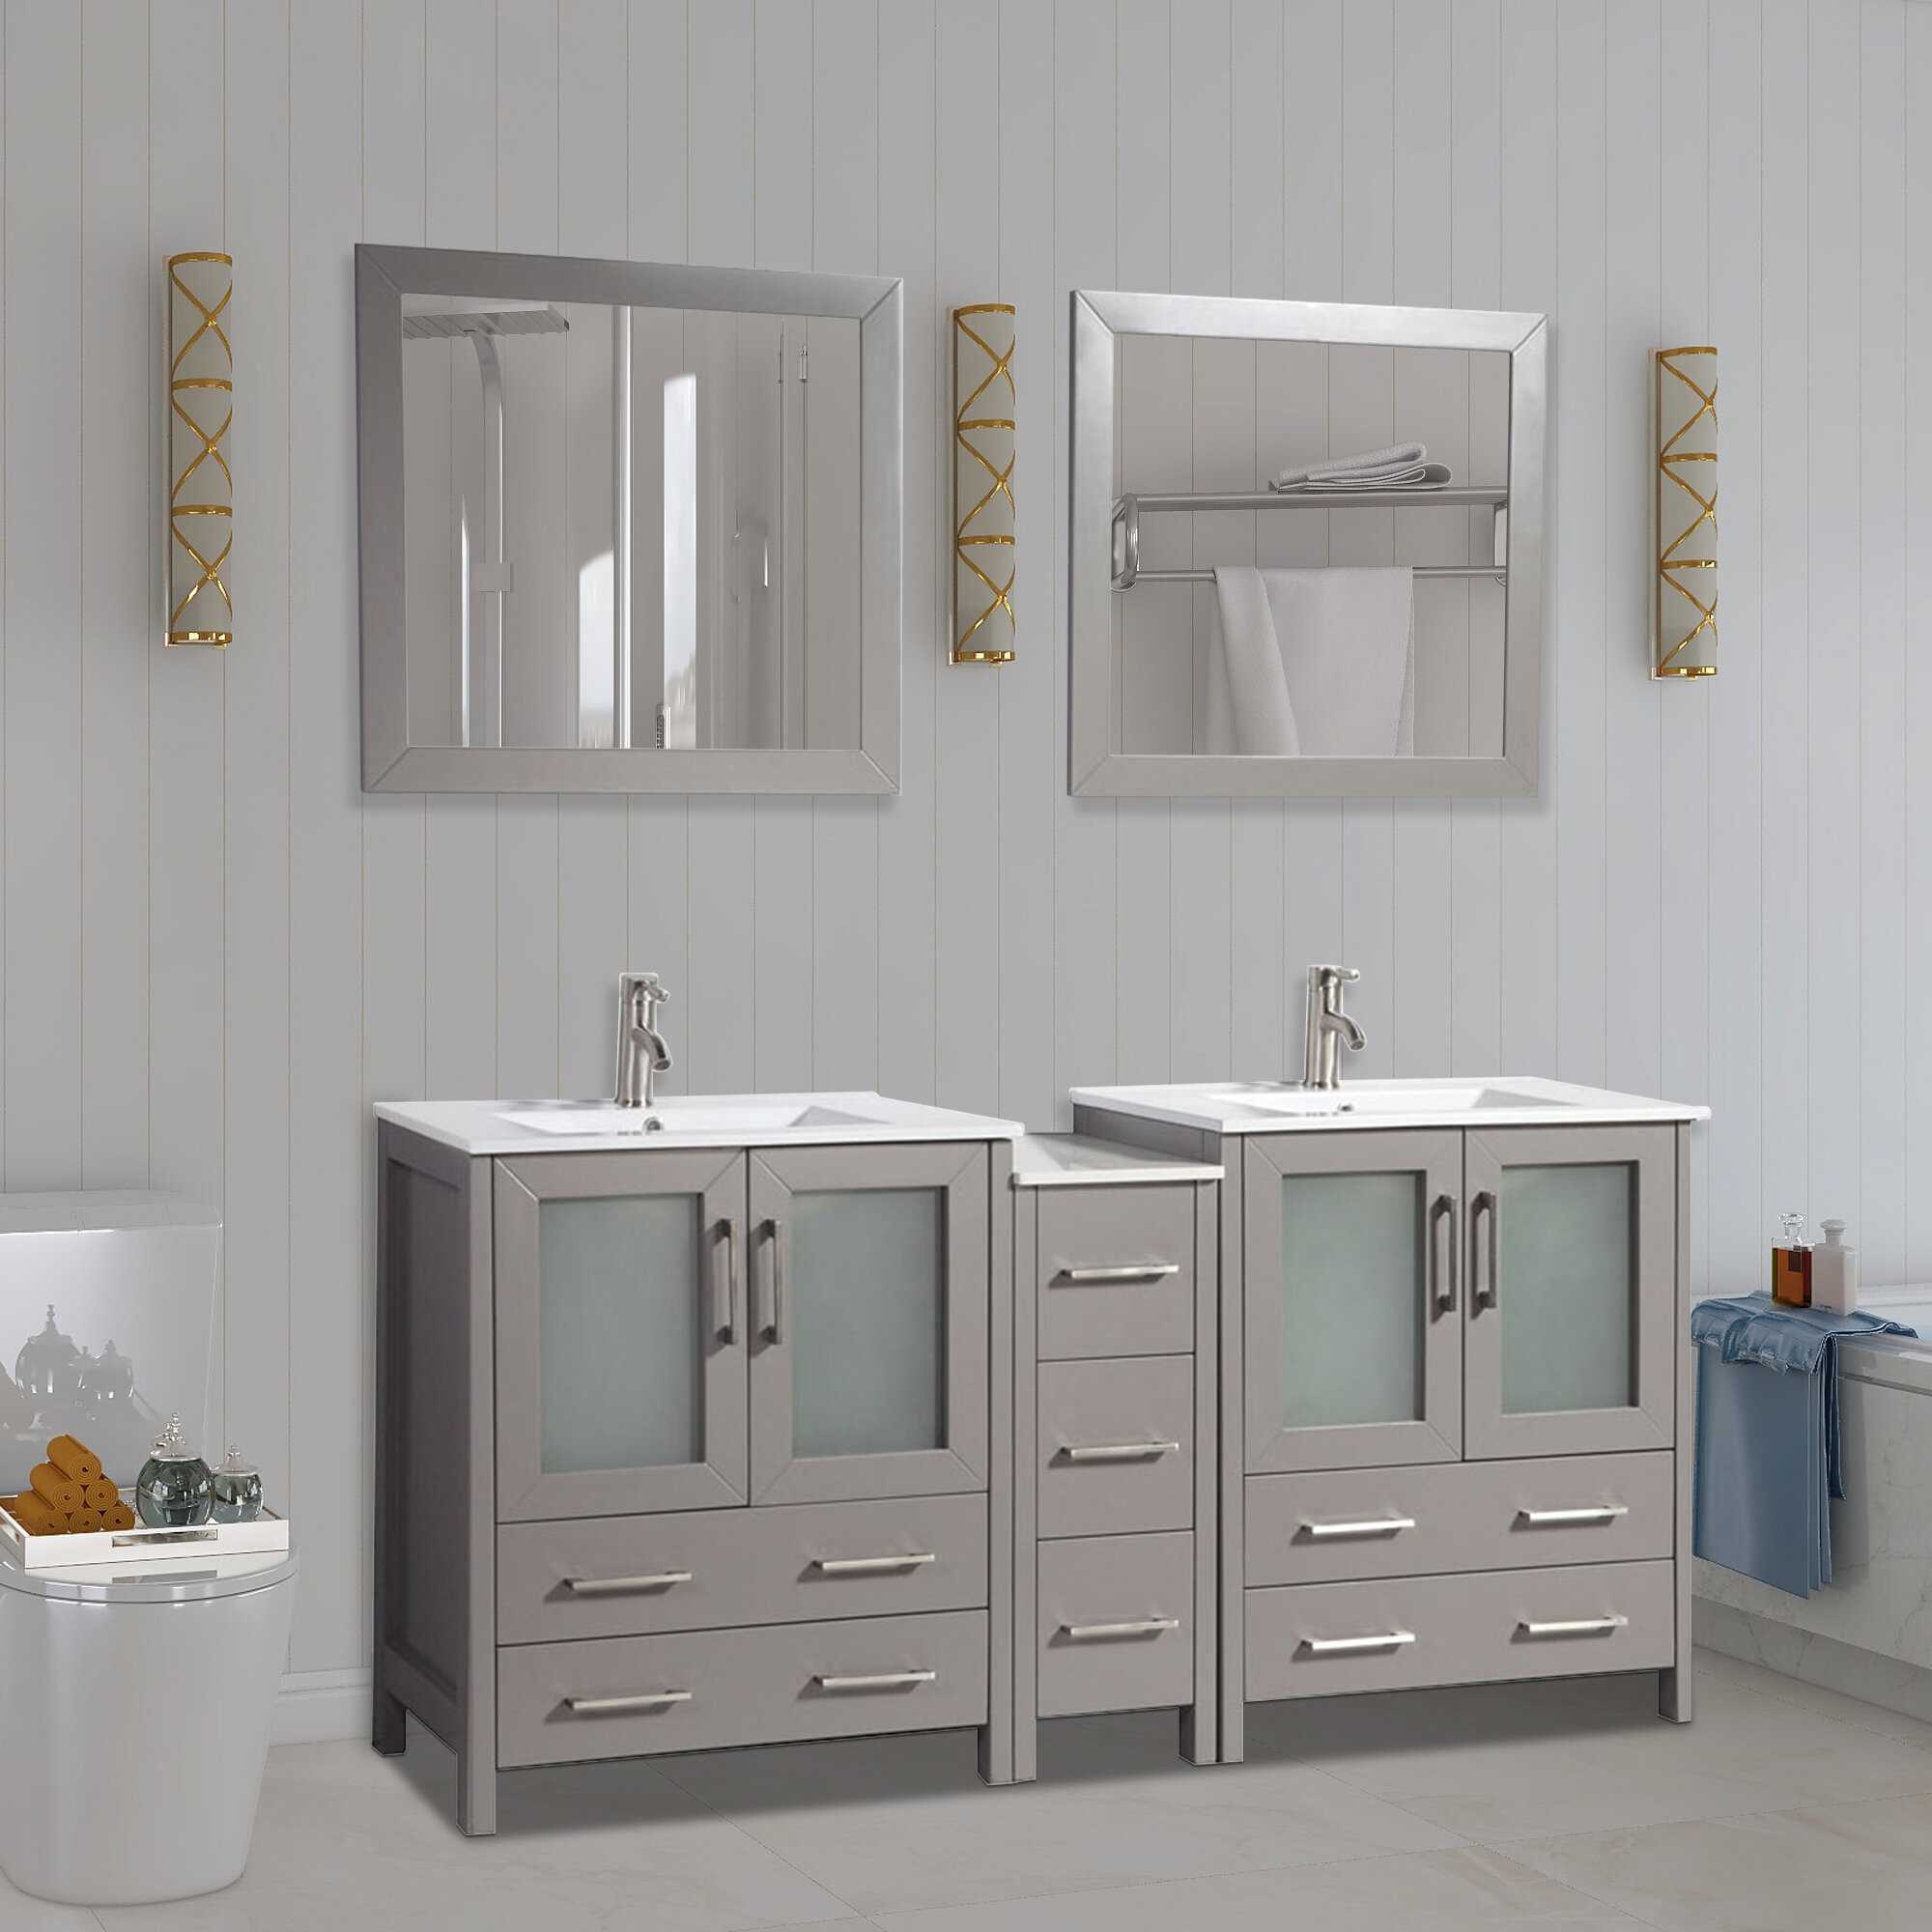 Hers Ceramic Knobs Pulls Kitchen Drawer Cabinet Vanity Closet 318 Furniture Door